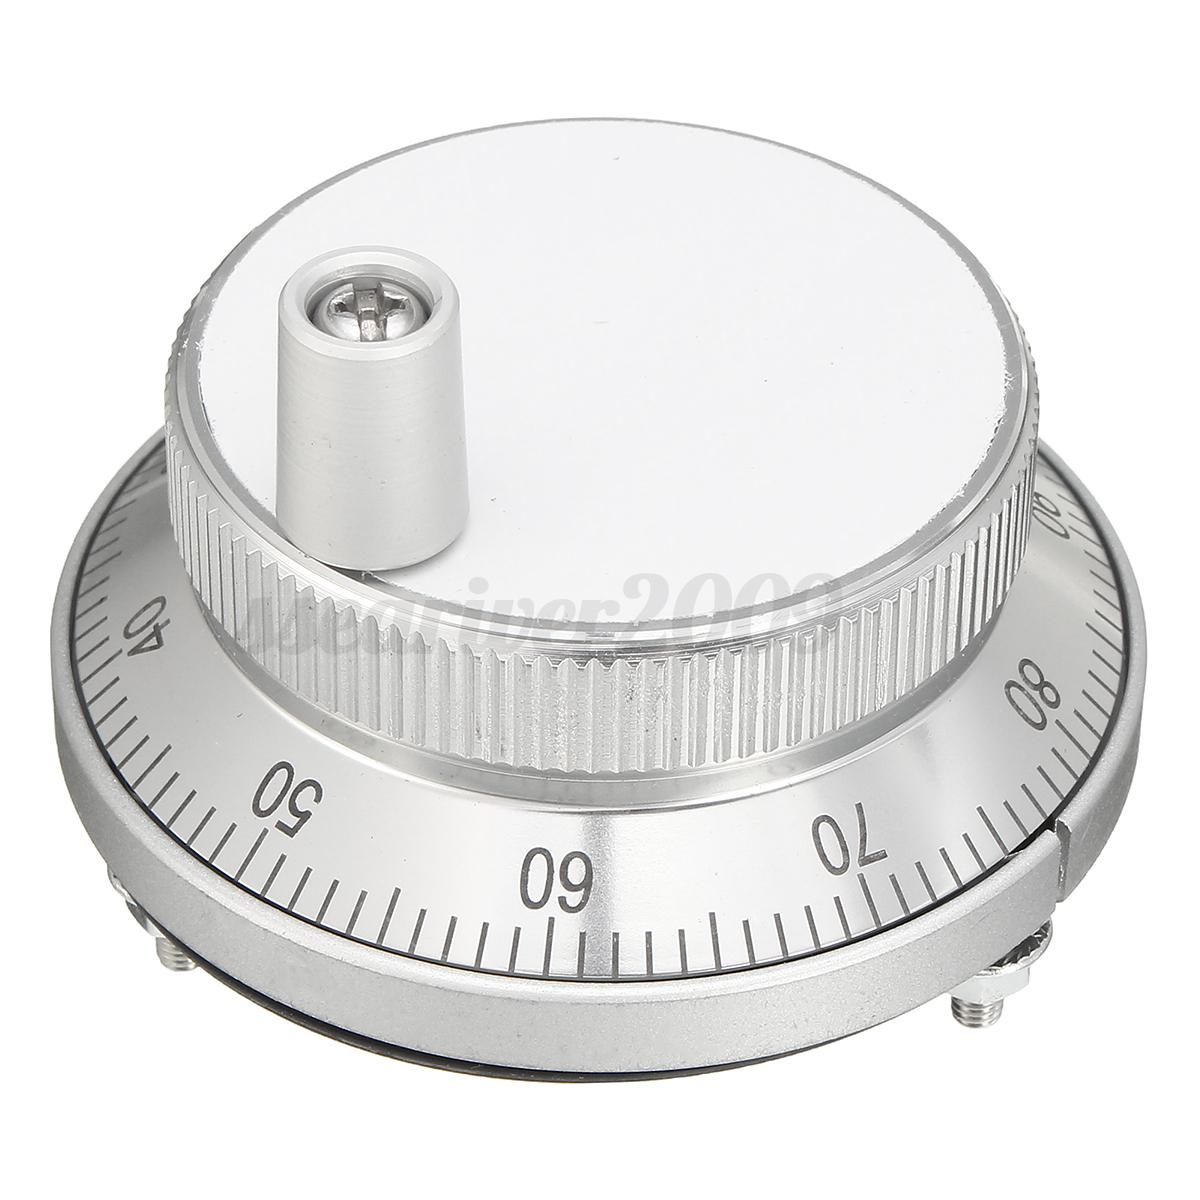 100ppr 6 Terminal Eletronic Hand Wheel Manual Pulse Encoder Haas Wiring Diagram Detail Image